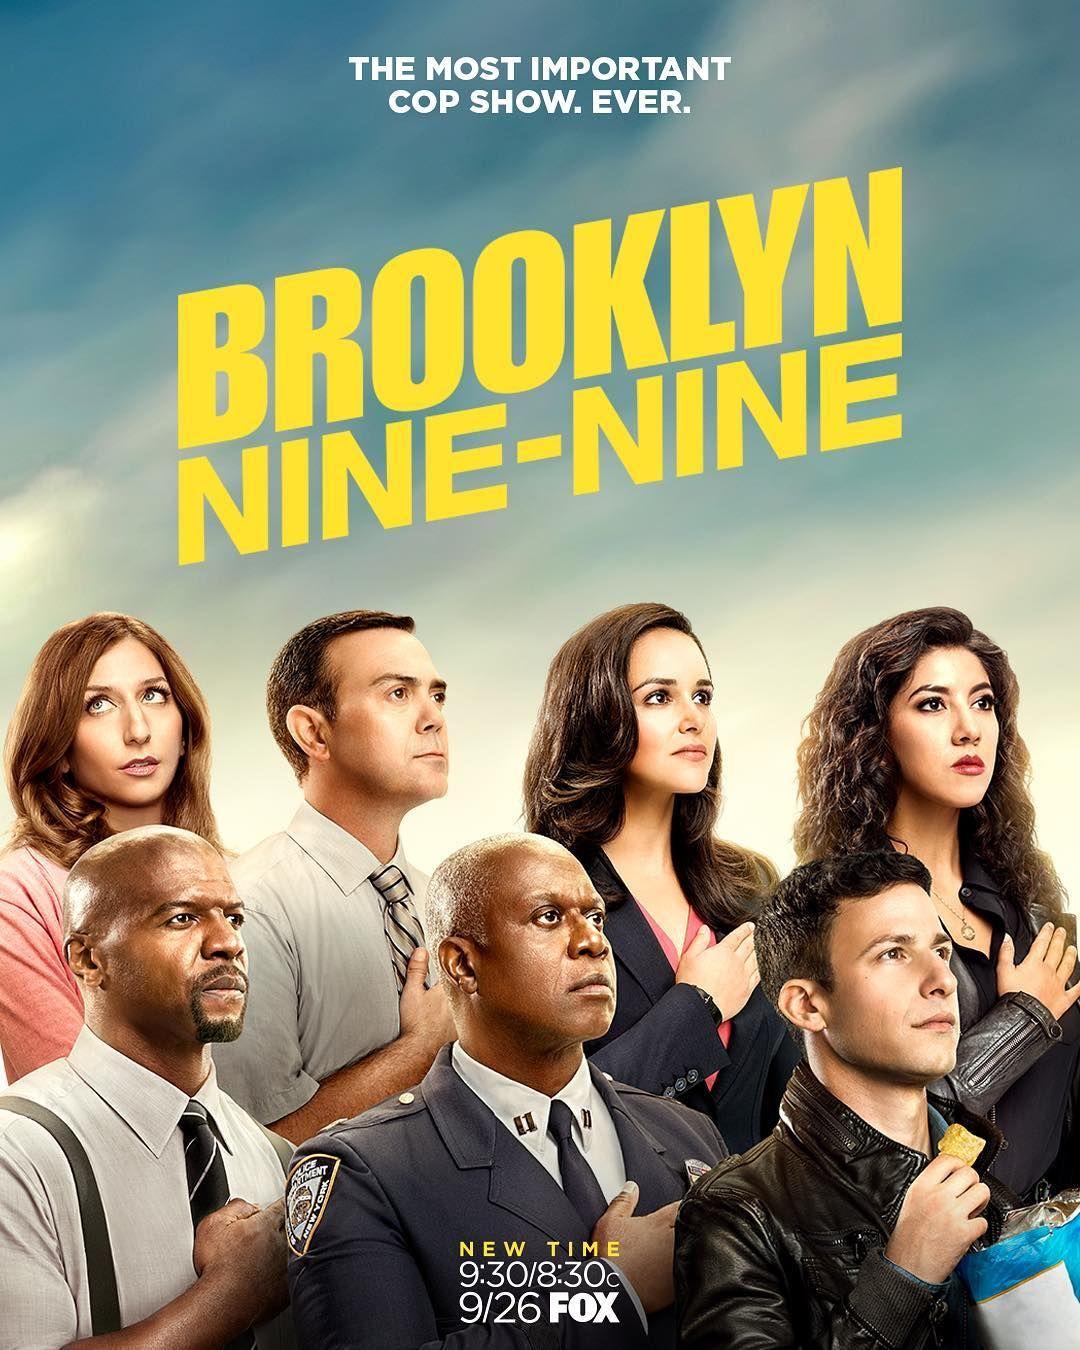 Brooklyn 99: Jeweils Staffel 1-5 Deutsch & 6 OmU Amazon Video (4,99€ bei iTunes) + Staffel 7 OmU 8,28€